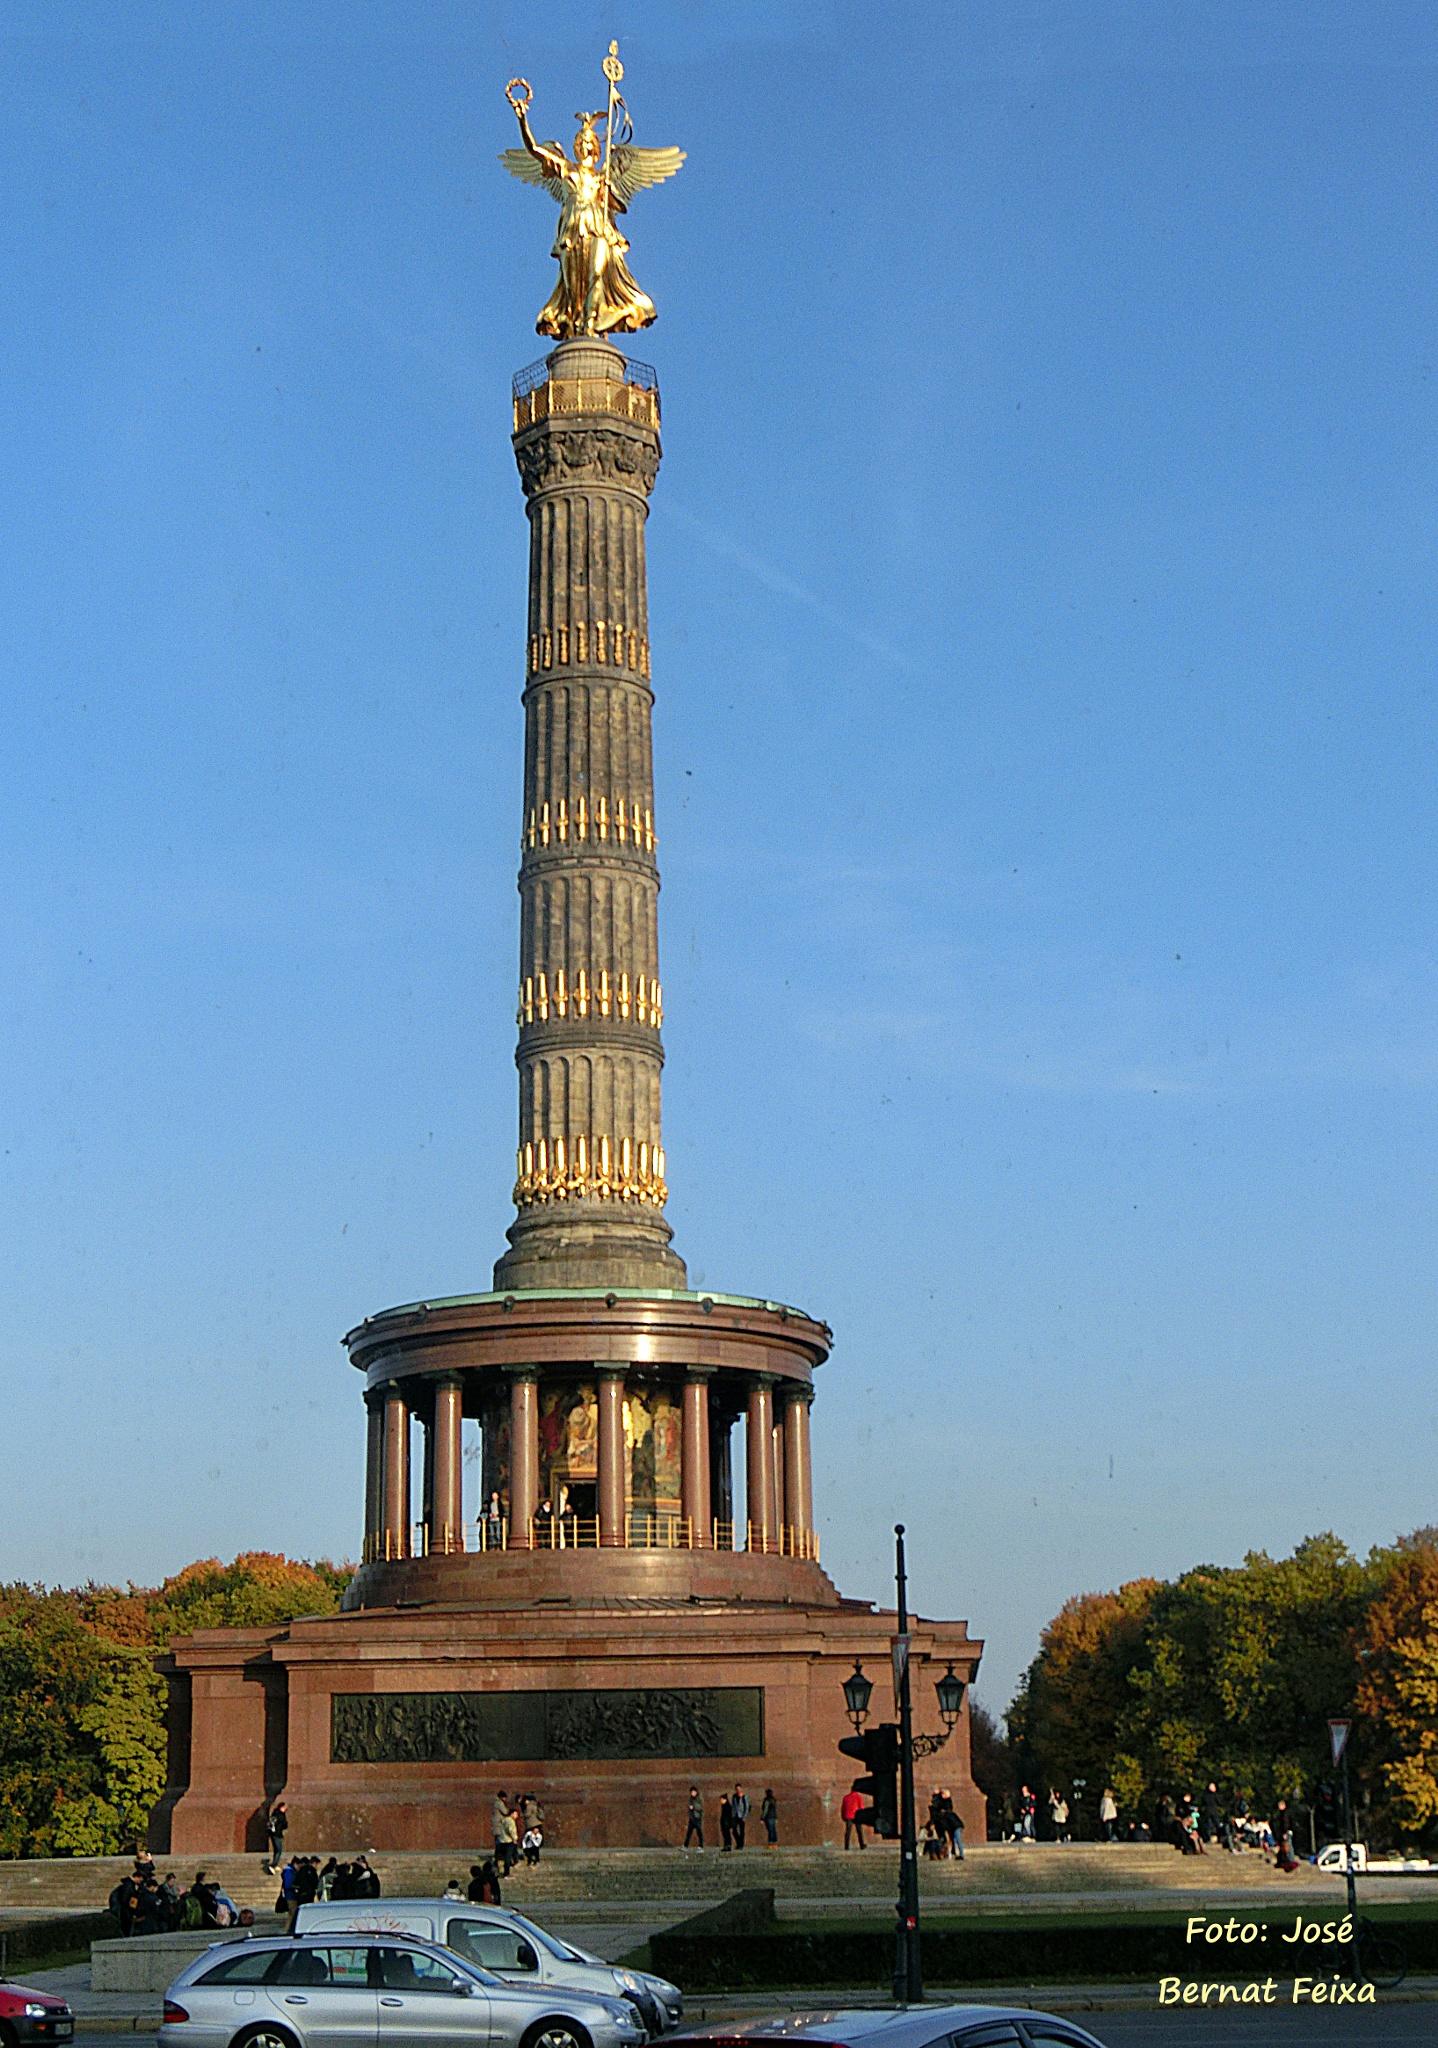 Columna de la Victoria, Siegessäule, Victory Column of Berlín by José Bernat Feixa